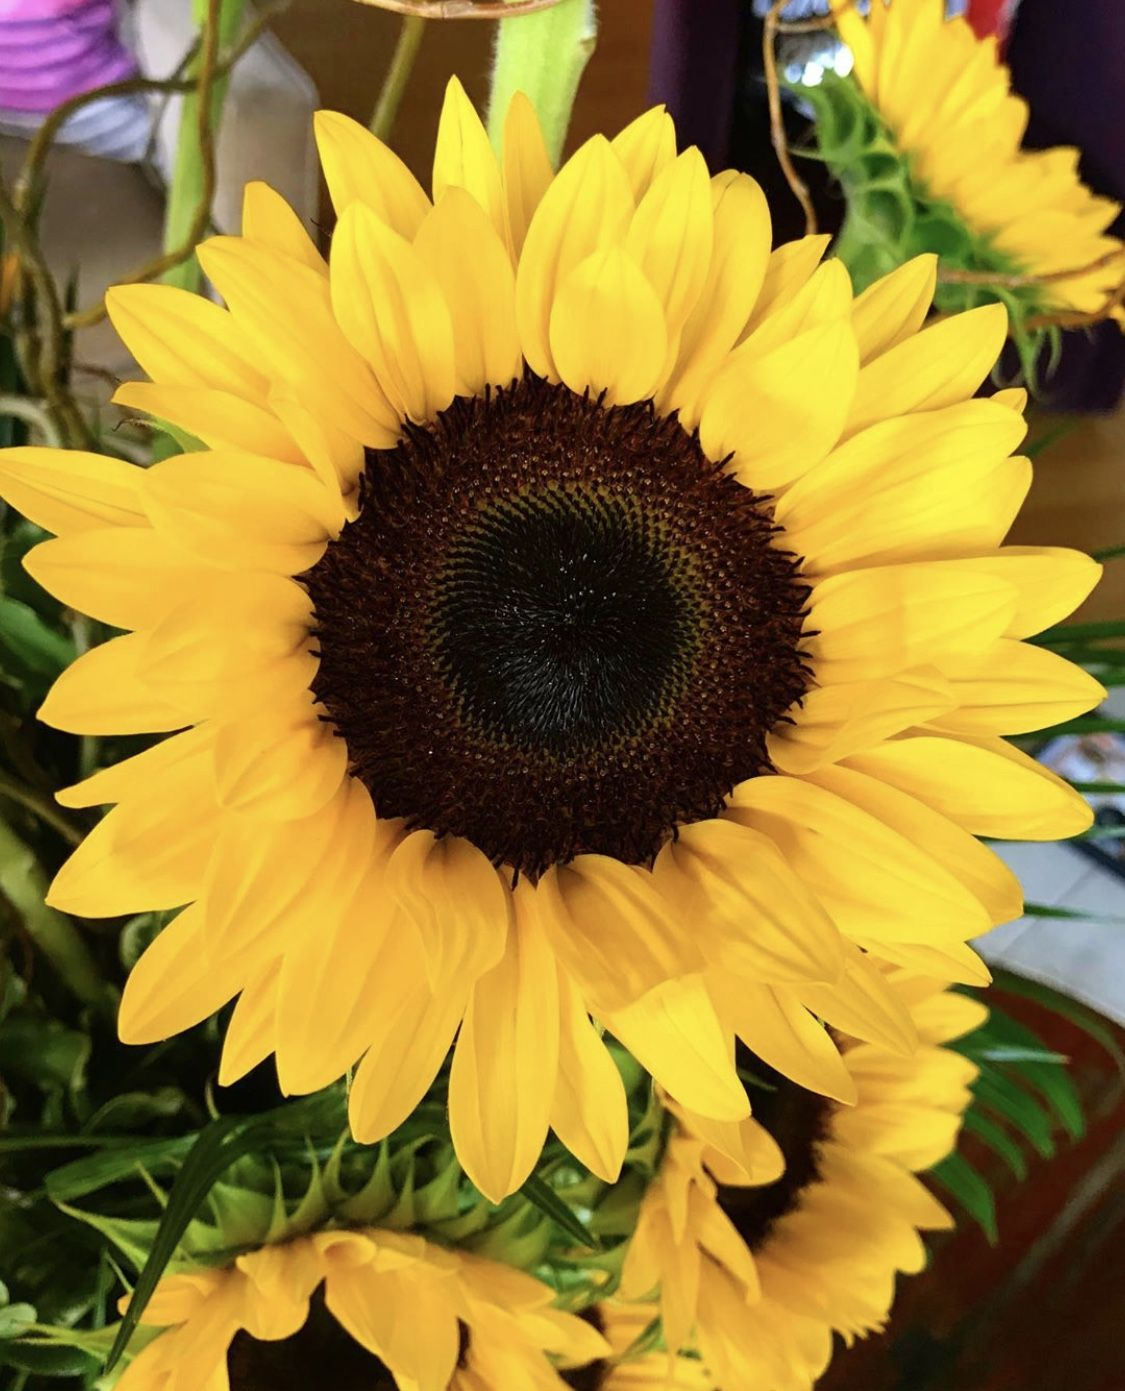 Gorgeous Sunflower  #florist #flowershop #flowers #florals #flowerarrangement #floralarrangement #flowerdesign #flowerstalking #flowerphotography #floraldesign #flowerdelivery #sunflower #sunflowers #summer #flowersoftheday #blooms #beautiful #flowerlover #flowerlovers #flowerslovers #flowerpower